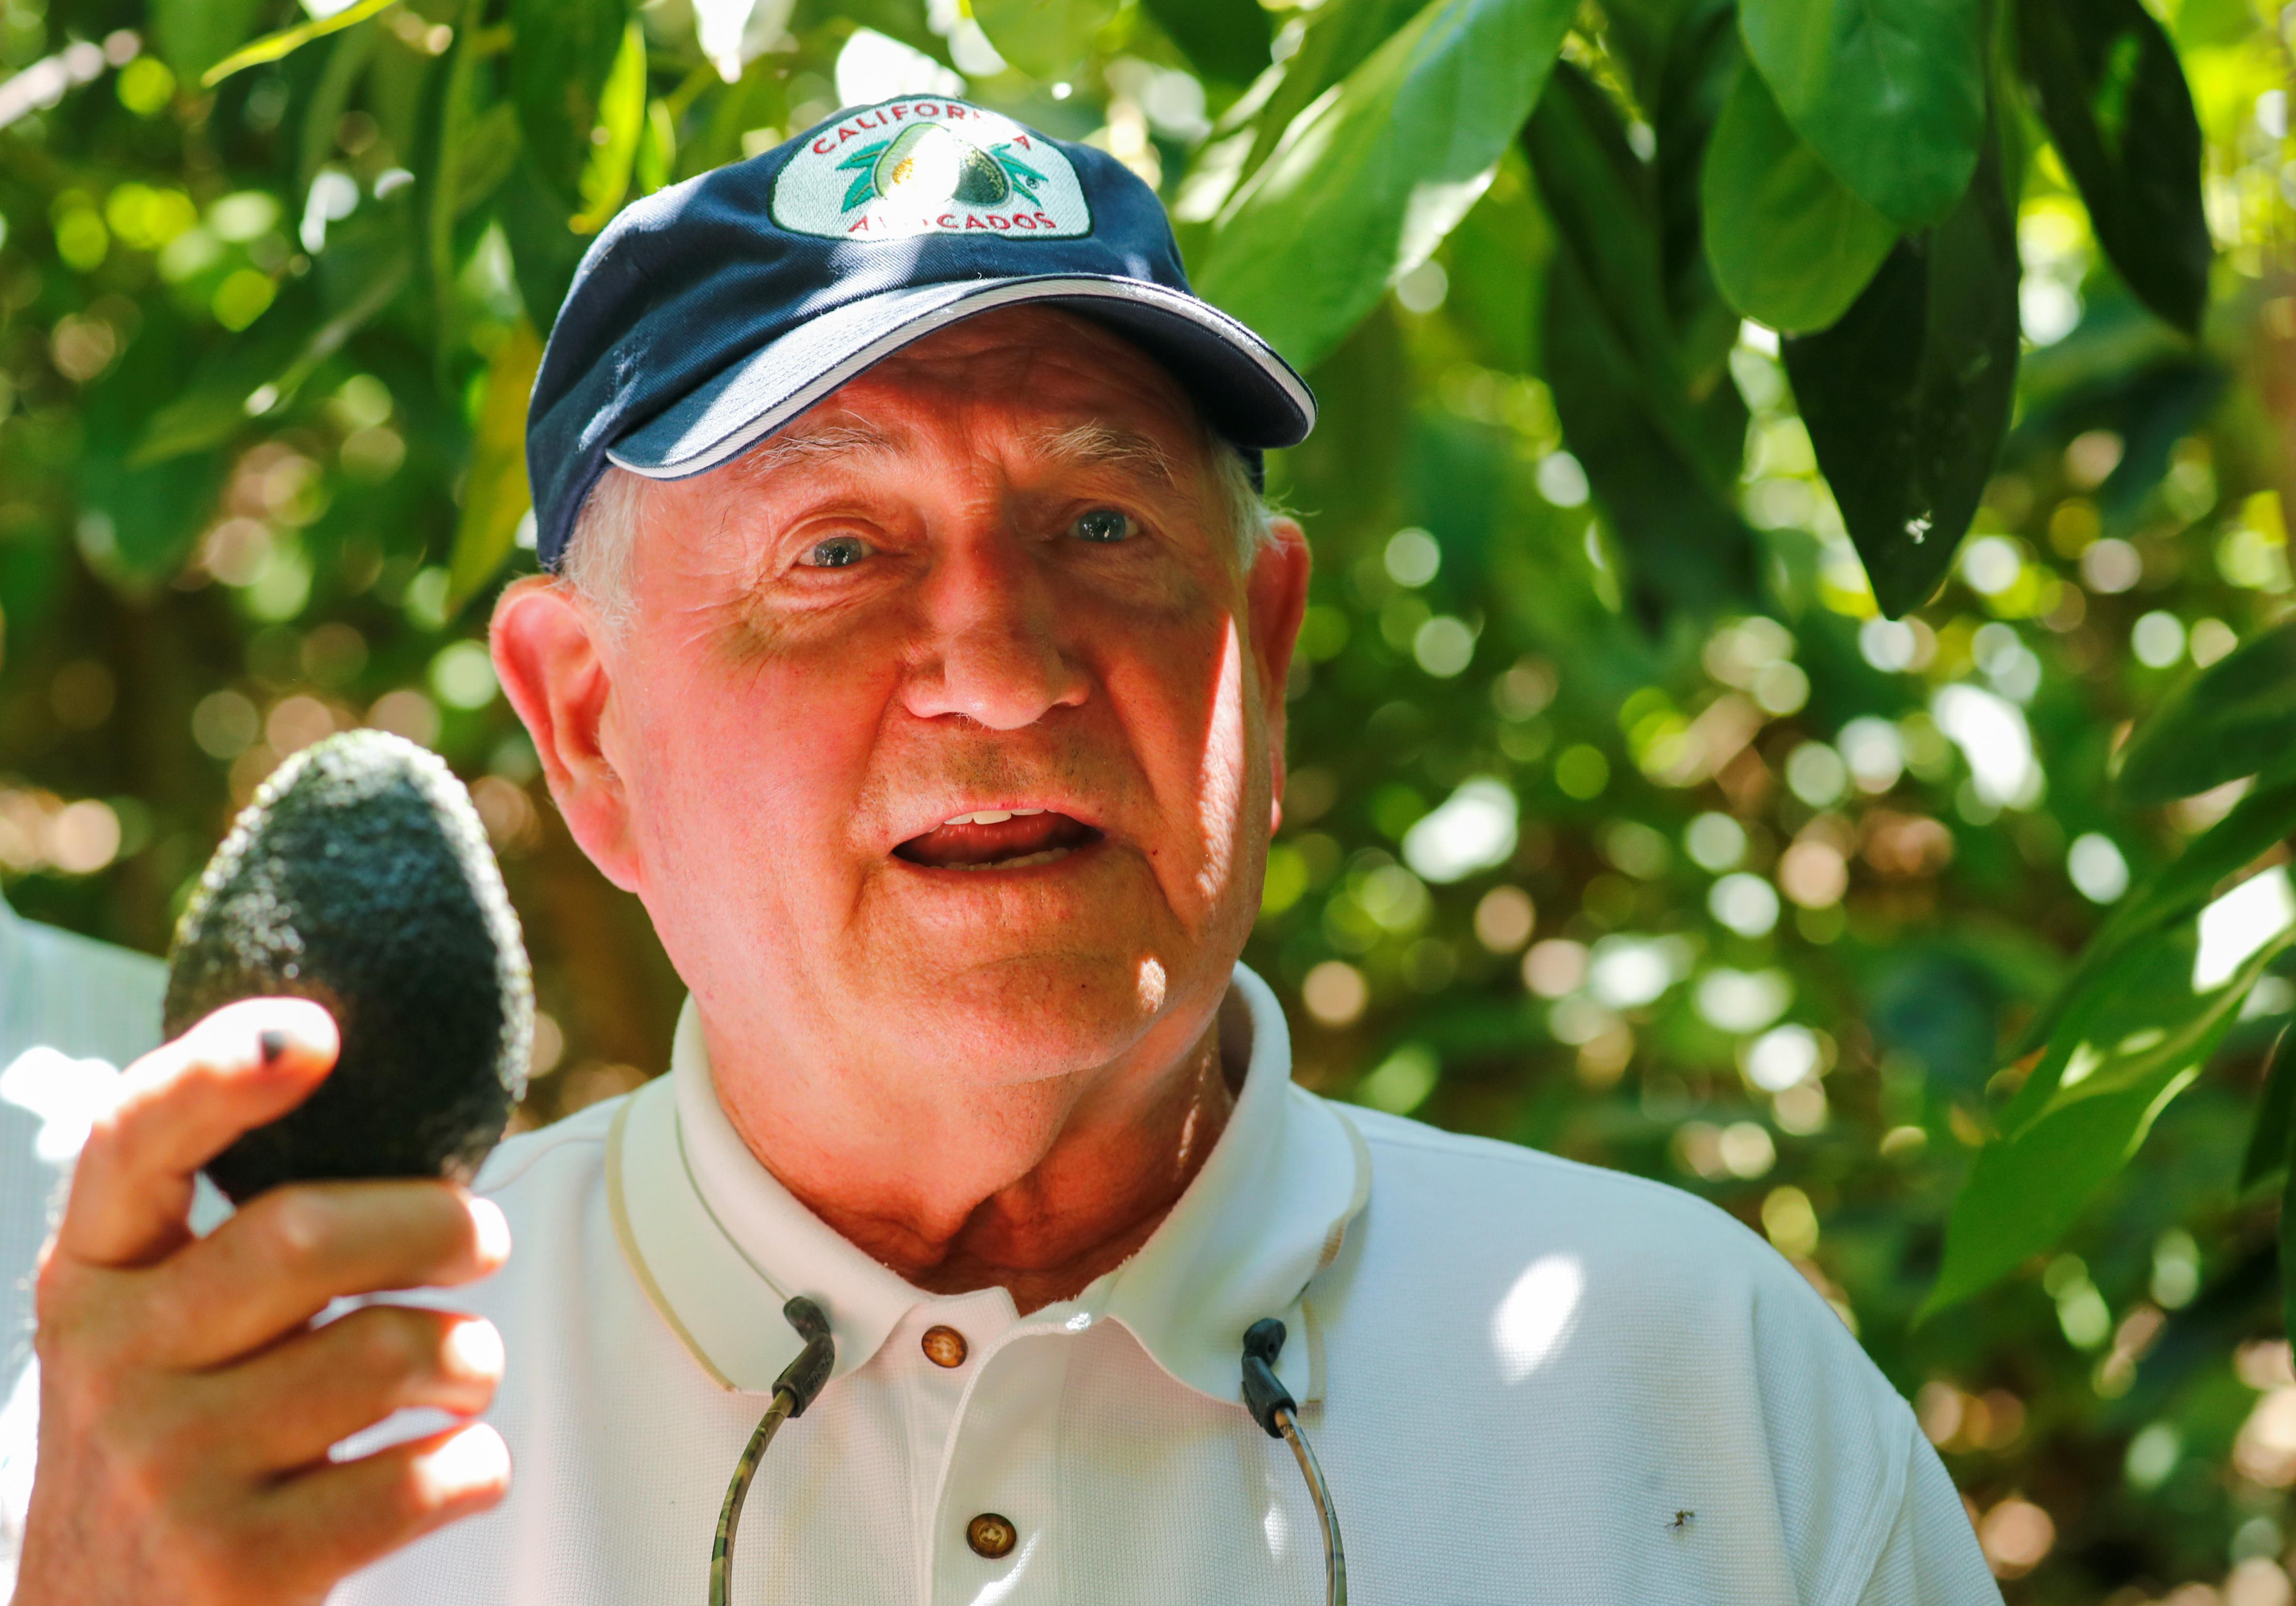 U.S. agriculture secretary to EU: follow 'sound science' on food...